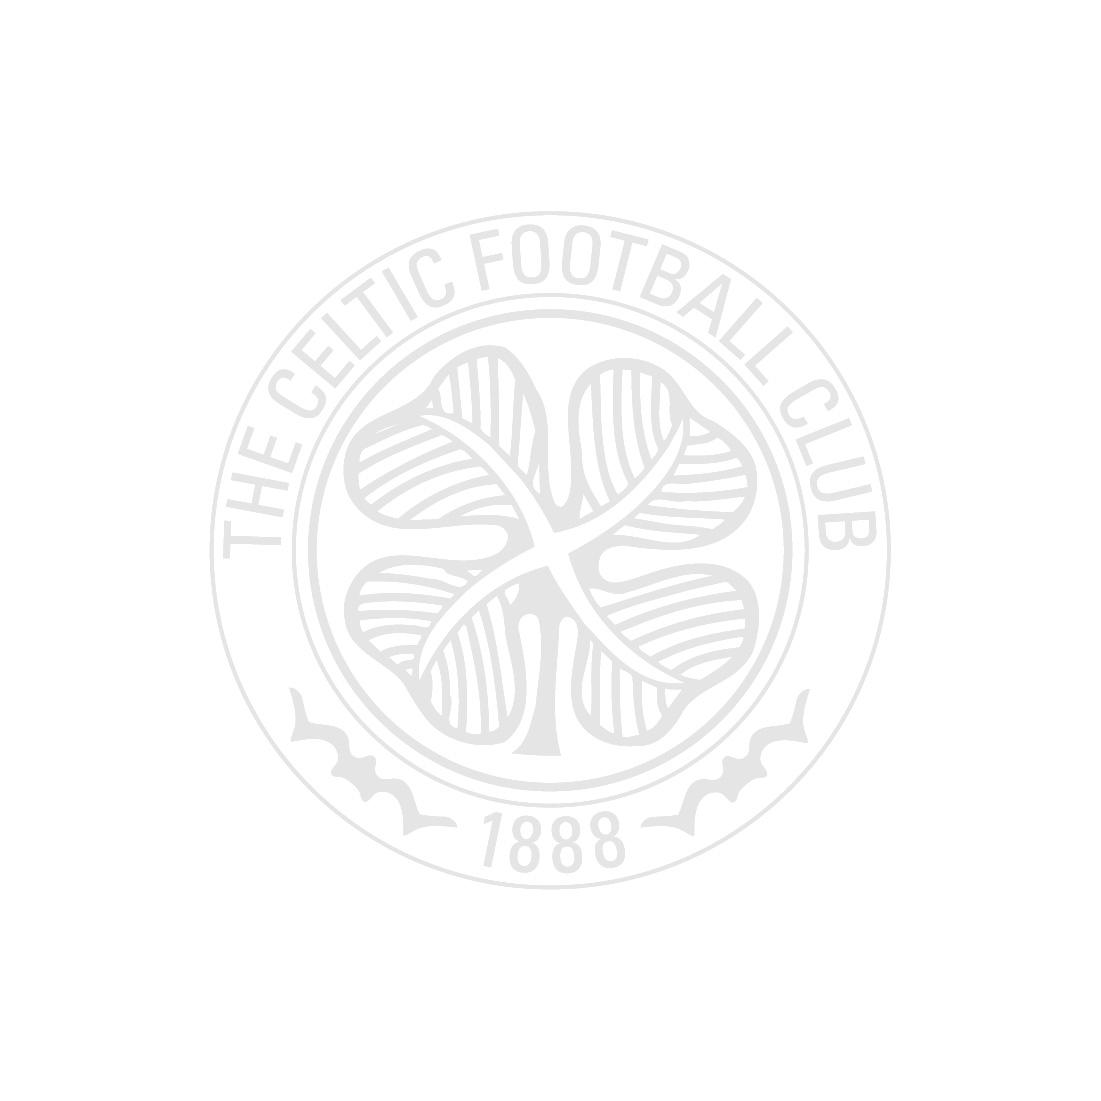 Celtic Mens Home Shirt 18/19 with Sponsor Back